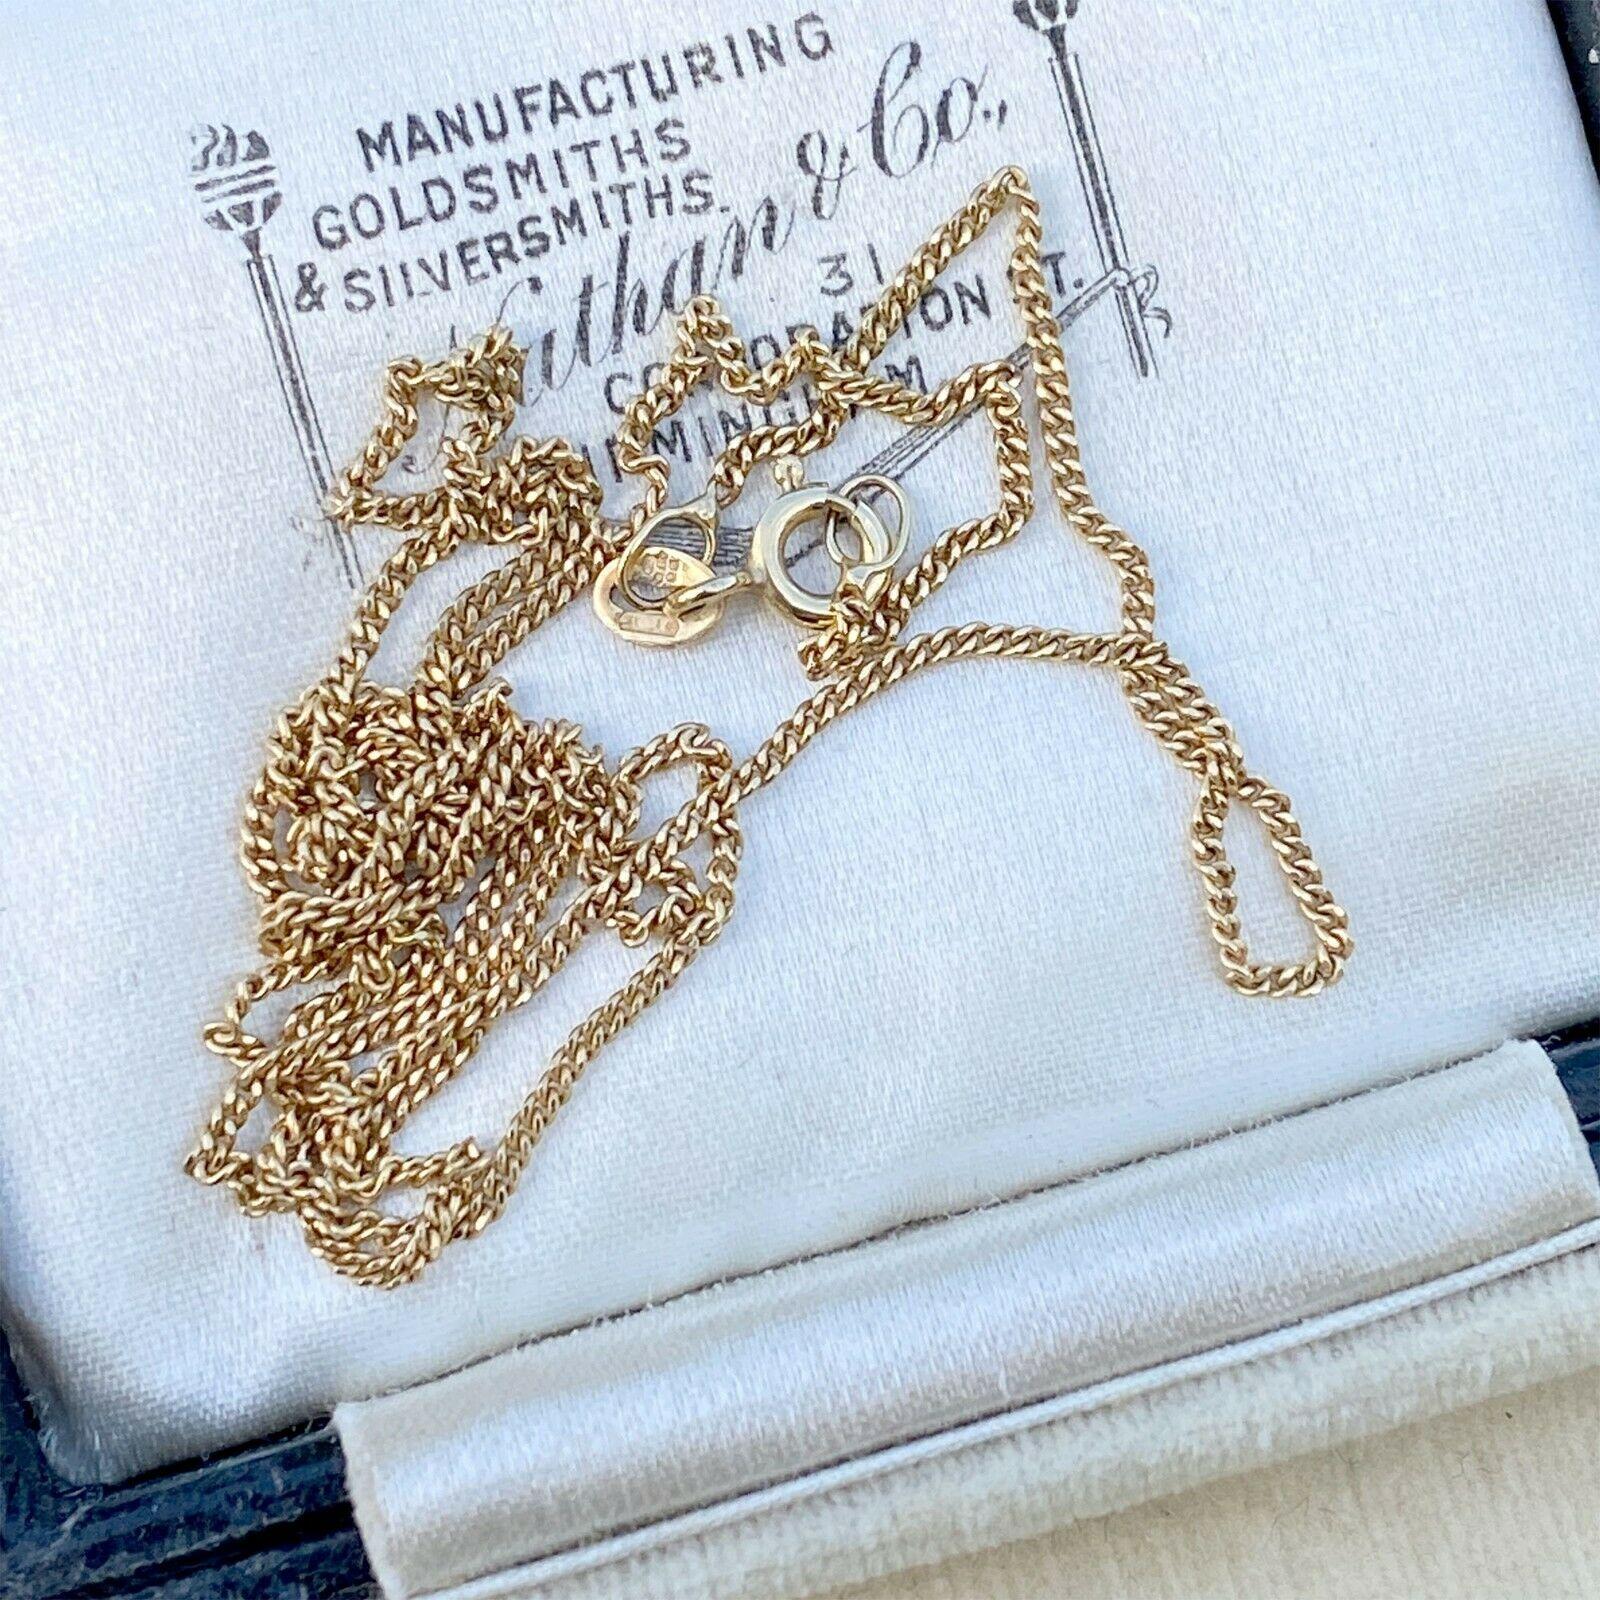 "Vintage 9ct, 9k, 375 Gold curb link chain, length 20"" / 51cm, 2.5 grams"